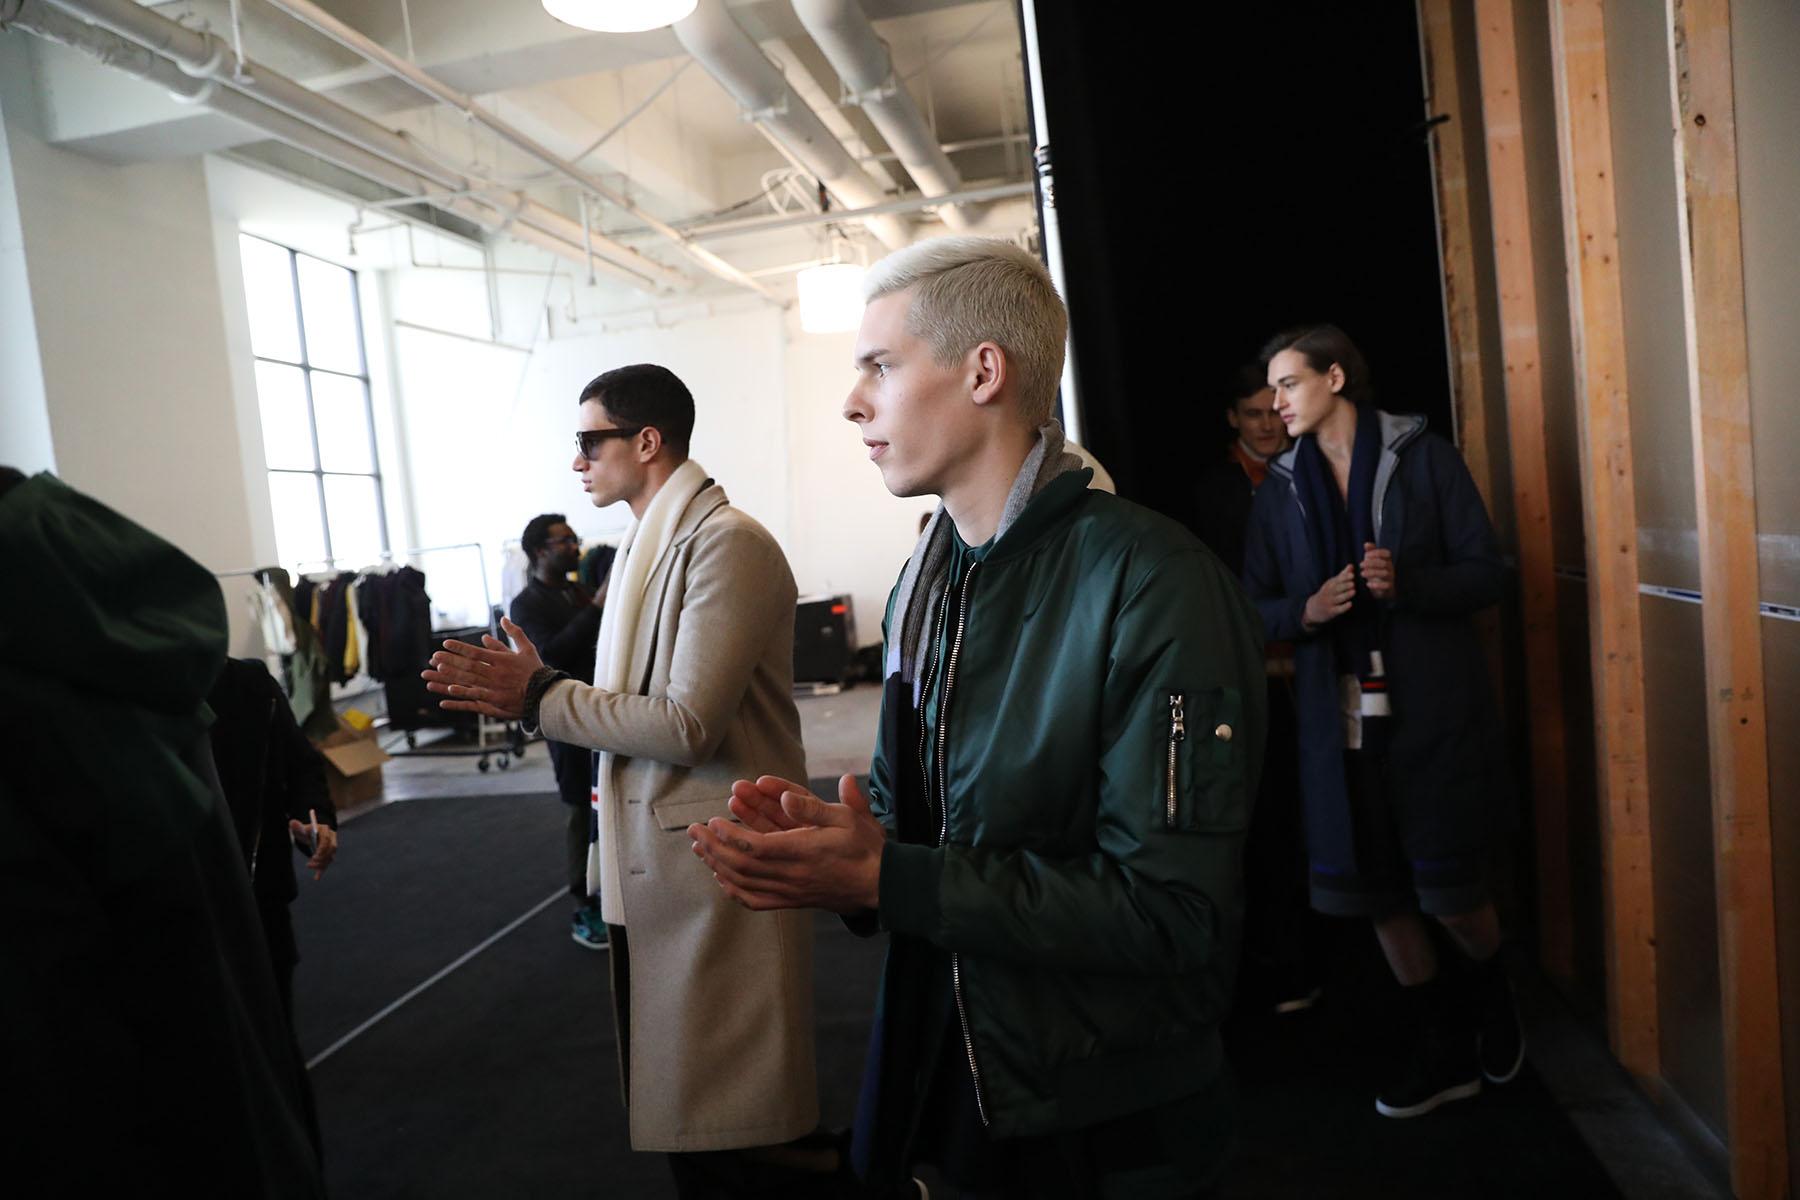 John-Elliott-Fall-2017-mens-fashion-show-backstage-the-impression-132